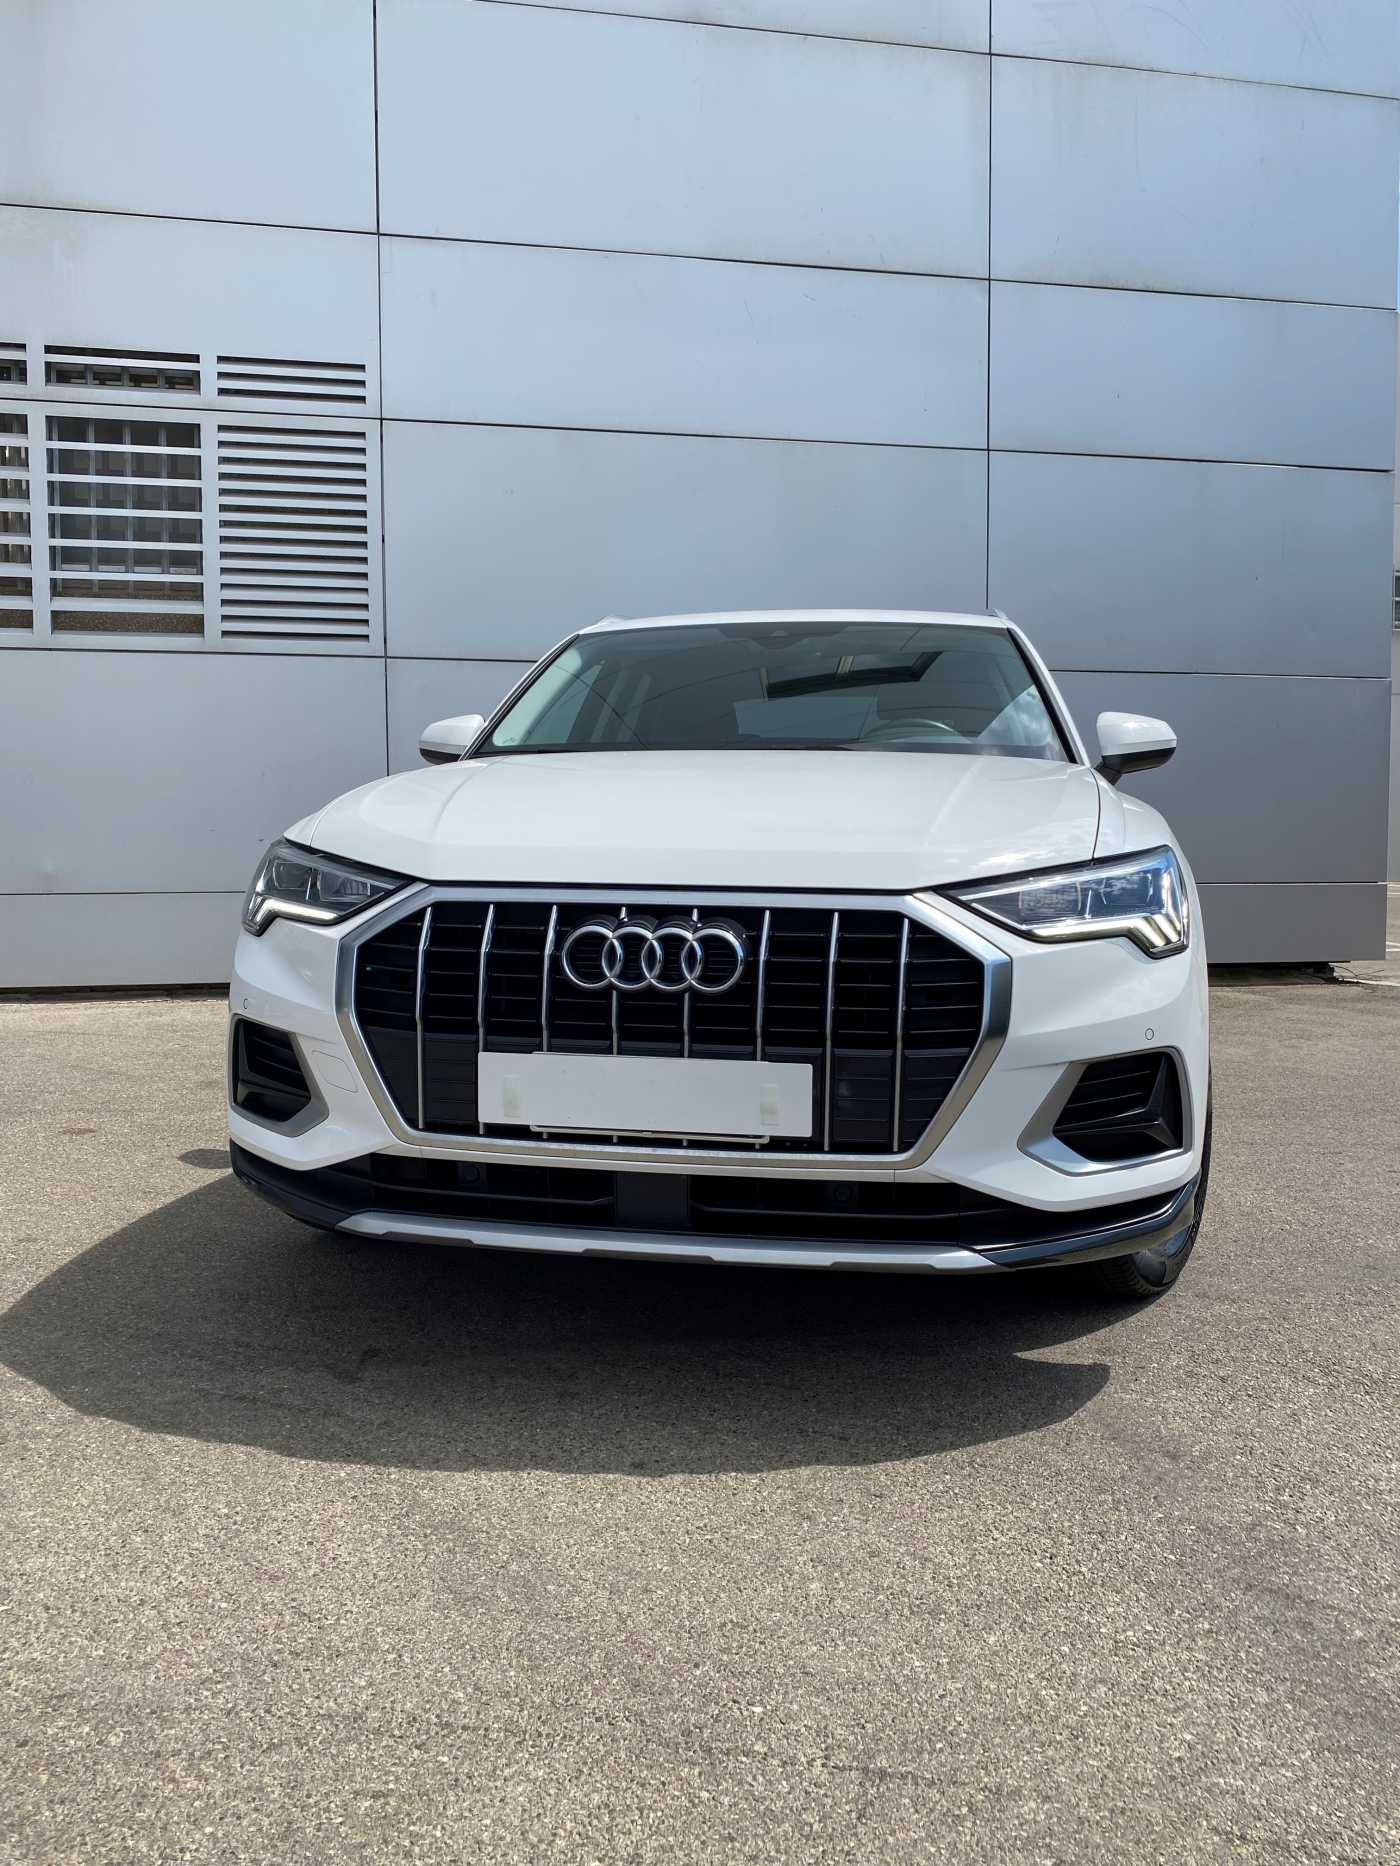 Audi - Q3 2ª serie usata in Sardegna - Concessionaria ufficiale Audi Catte Auto Cagliari